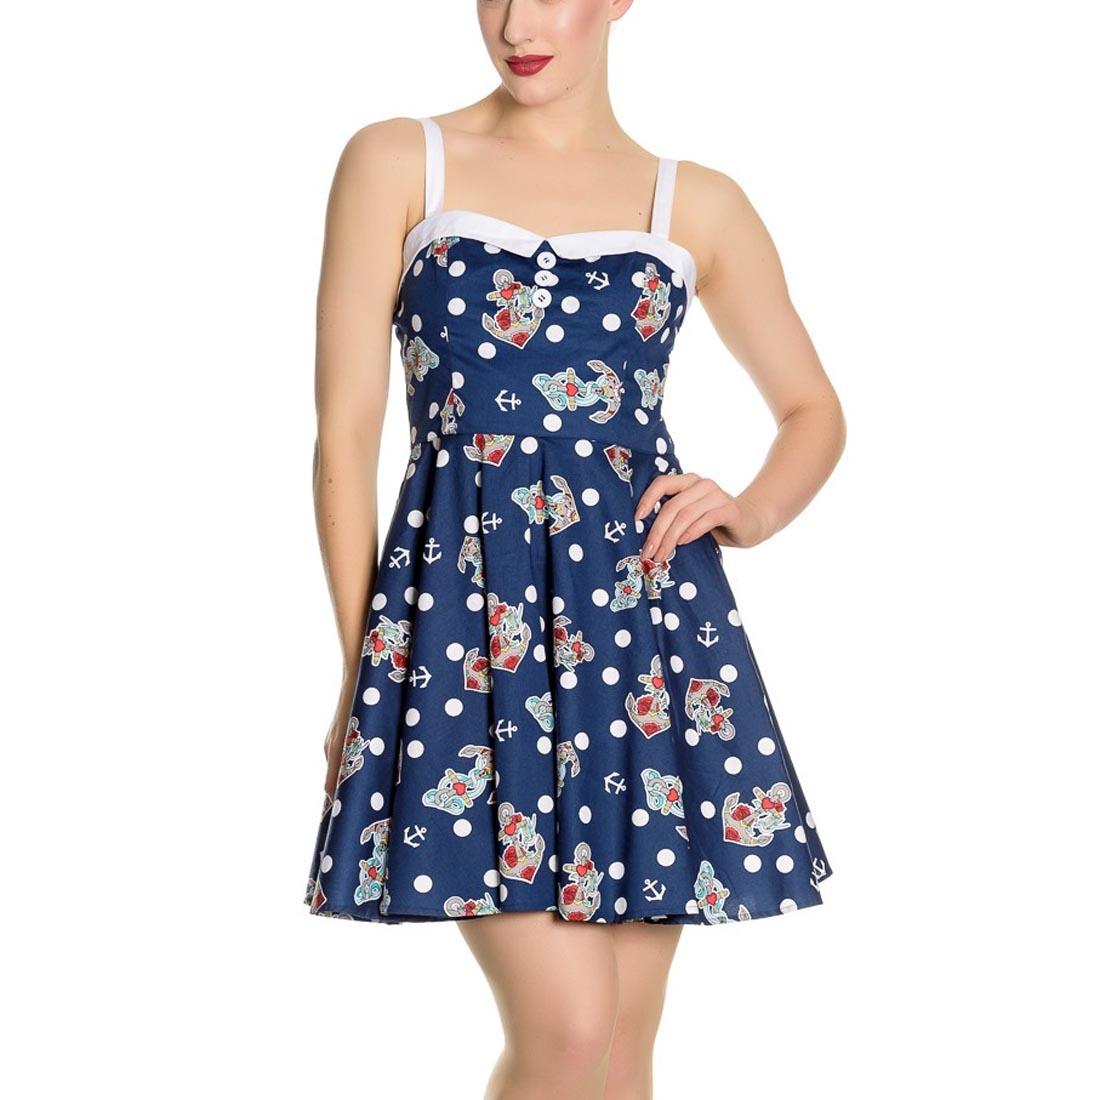 Hell-Bunny-Navy-Blue-50s-Nautical-Mini-Dress-OCEANA-Polka-Dot-All-Sizes thumbnail 15